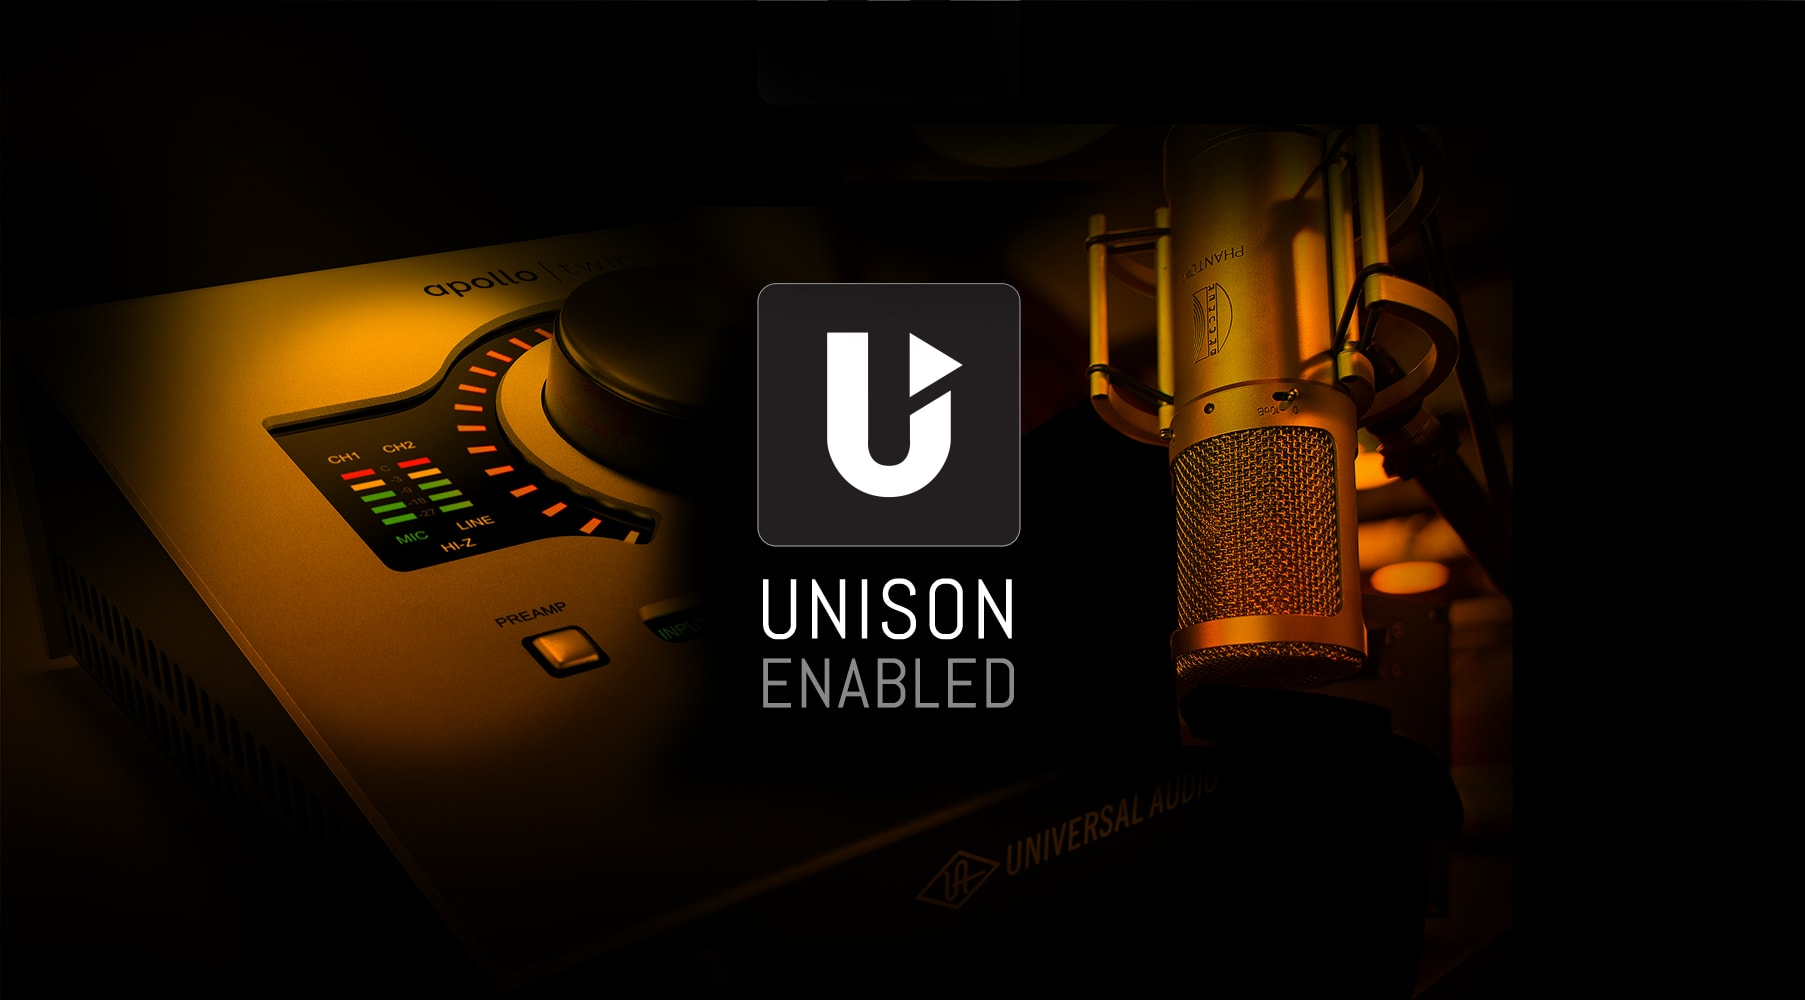 Apollo Recording w/ Unison™-enabled UAD Powered Plug-Ins